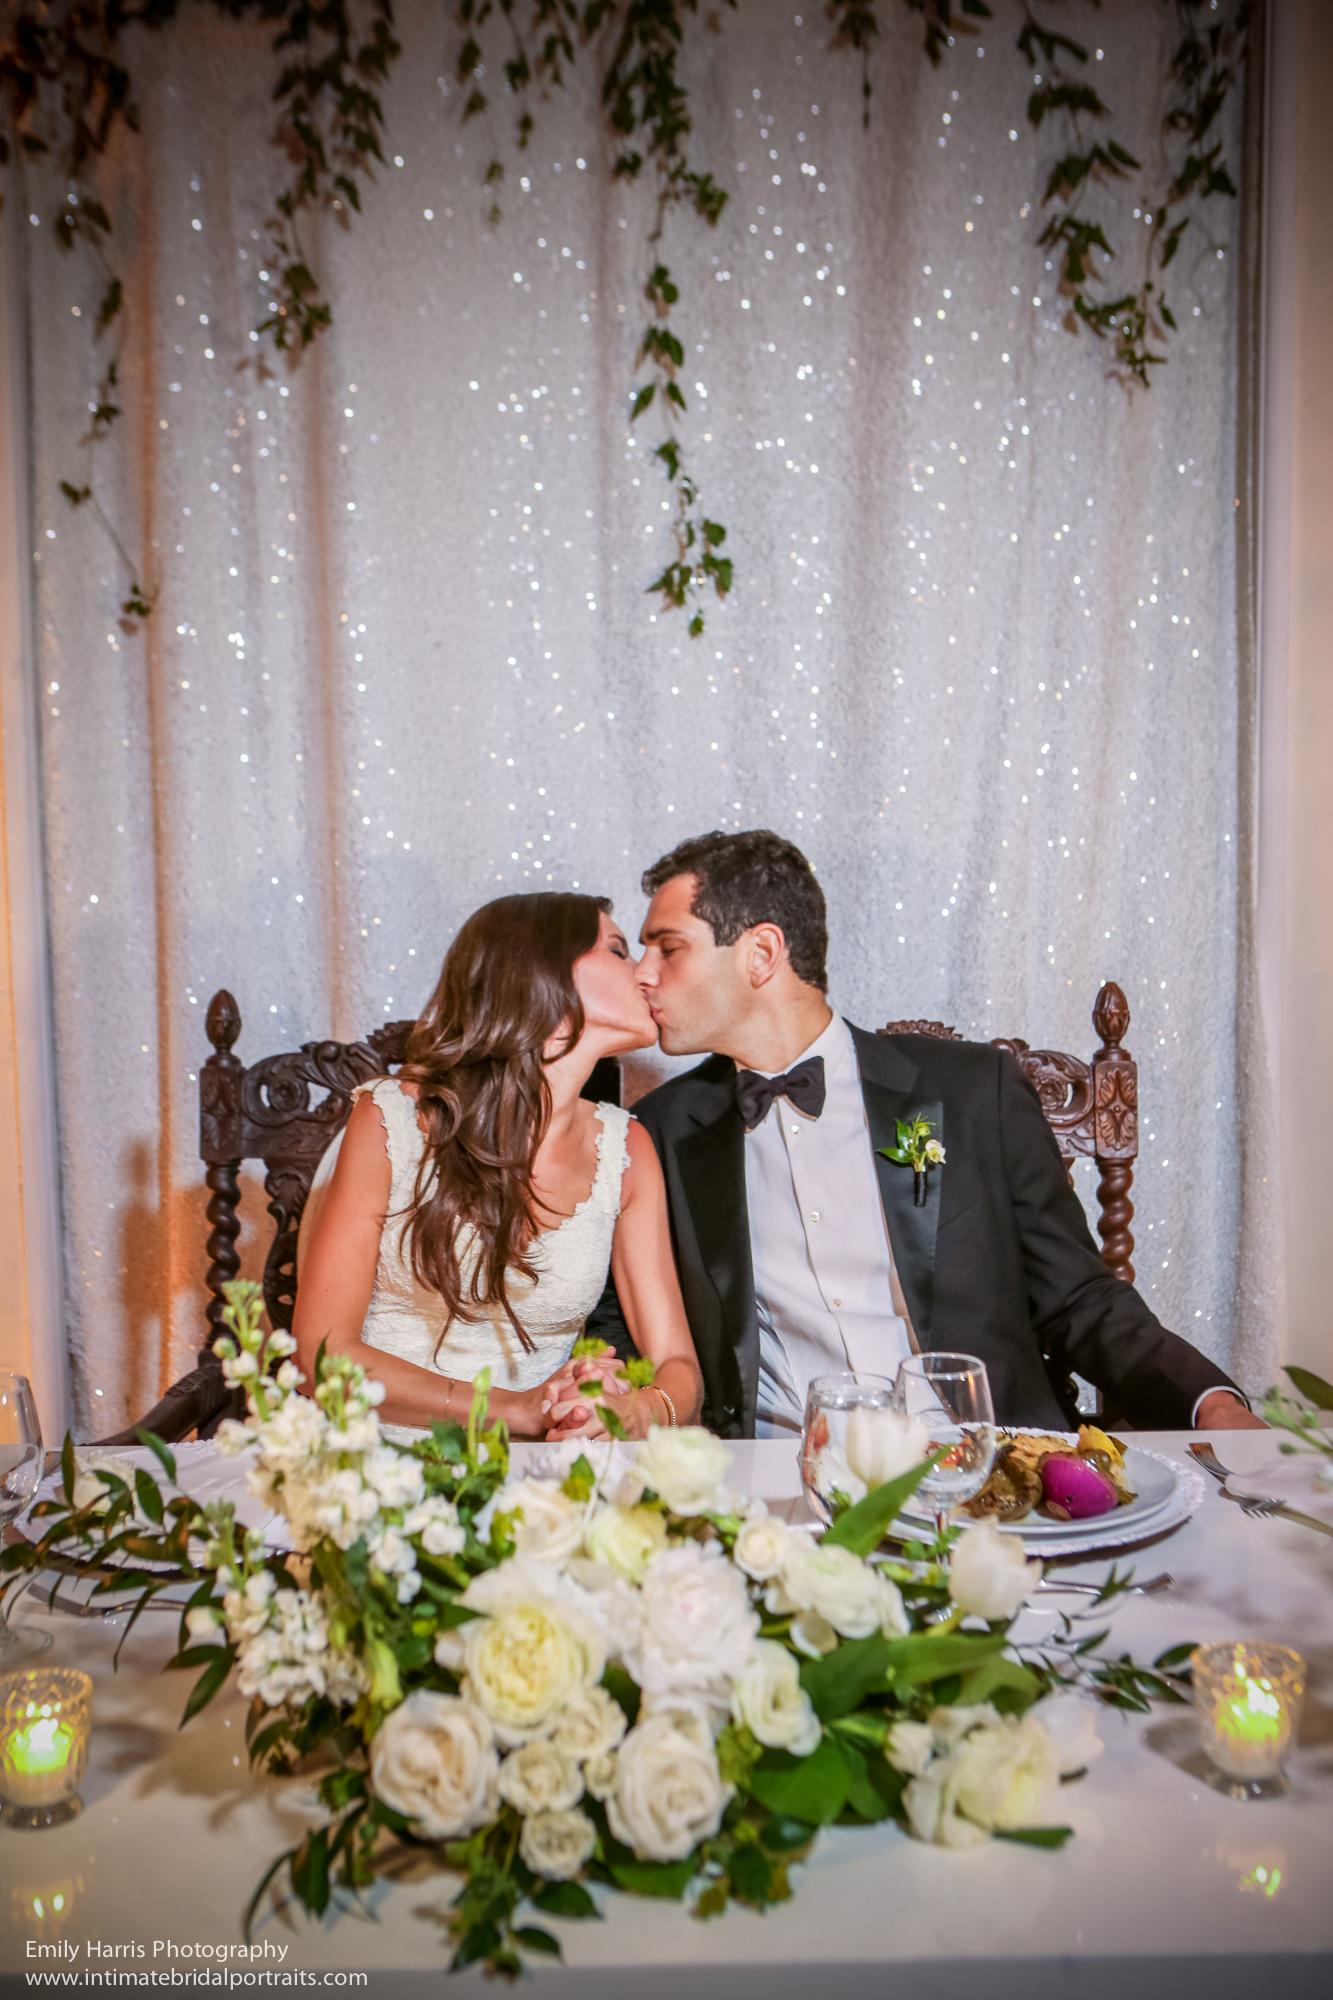 Classic romantic all-white wedding at The Bath Club